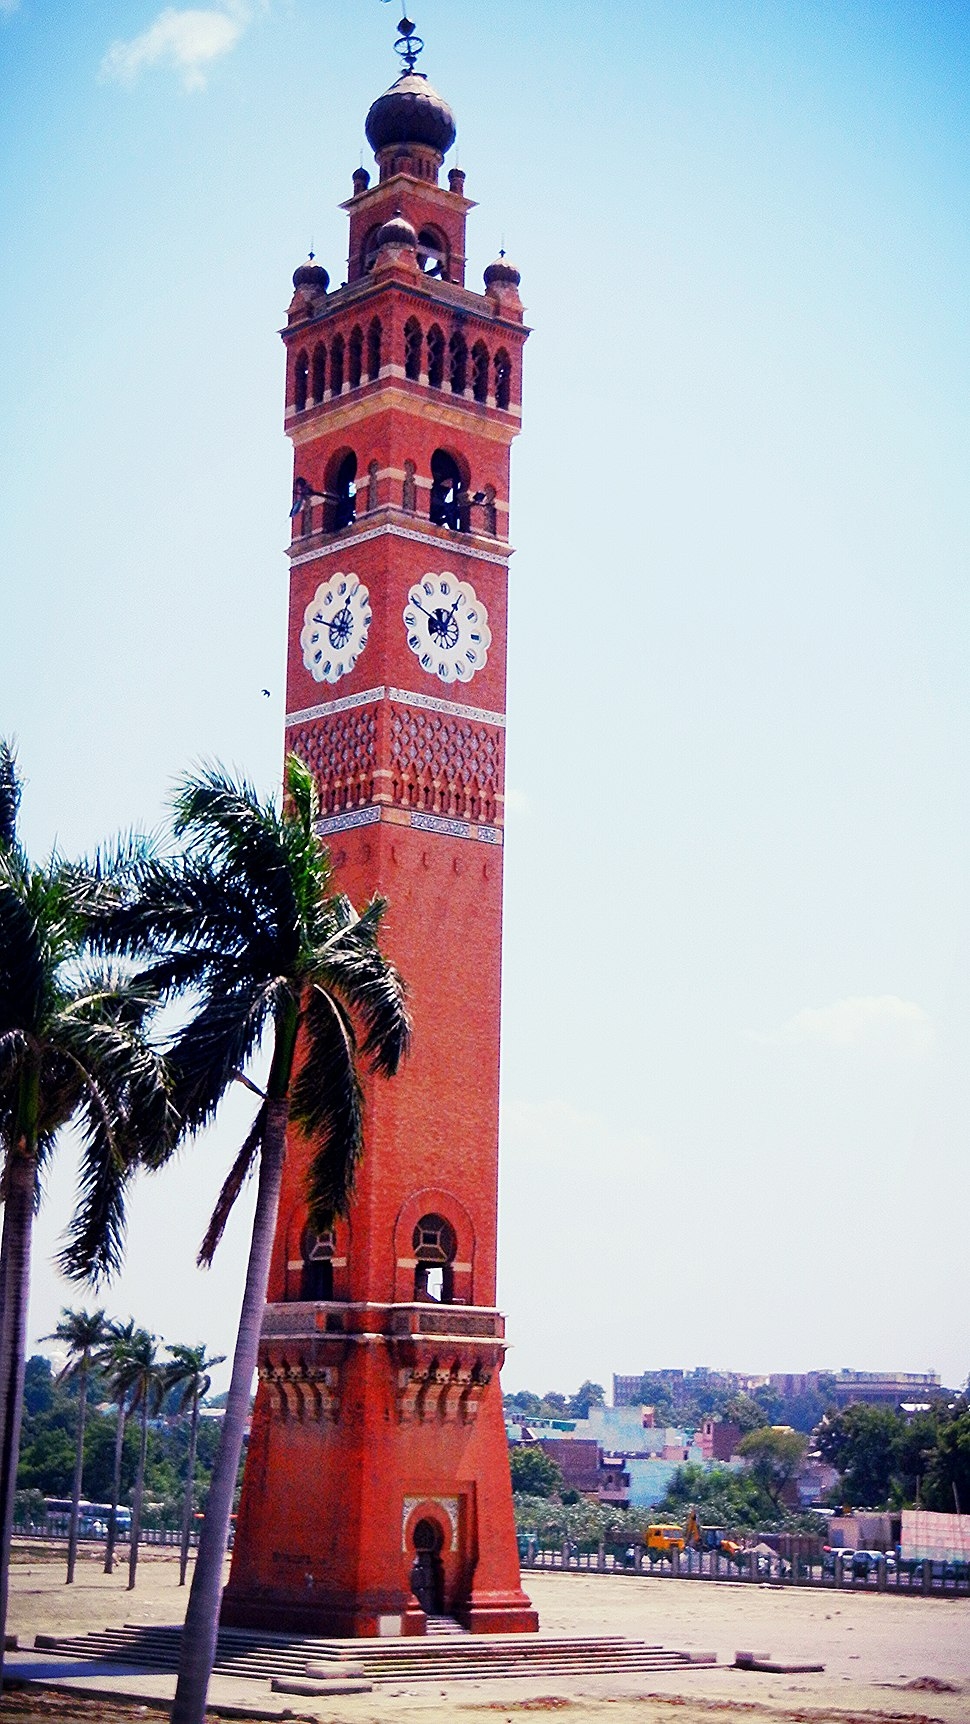 Ghanta Ghar, the tallest clock tower in India